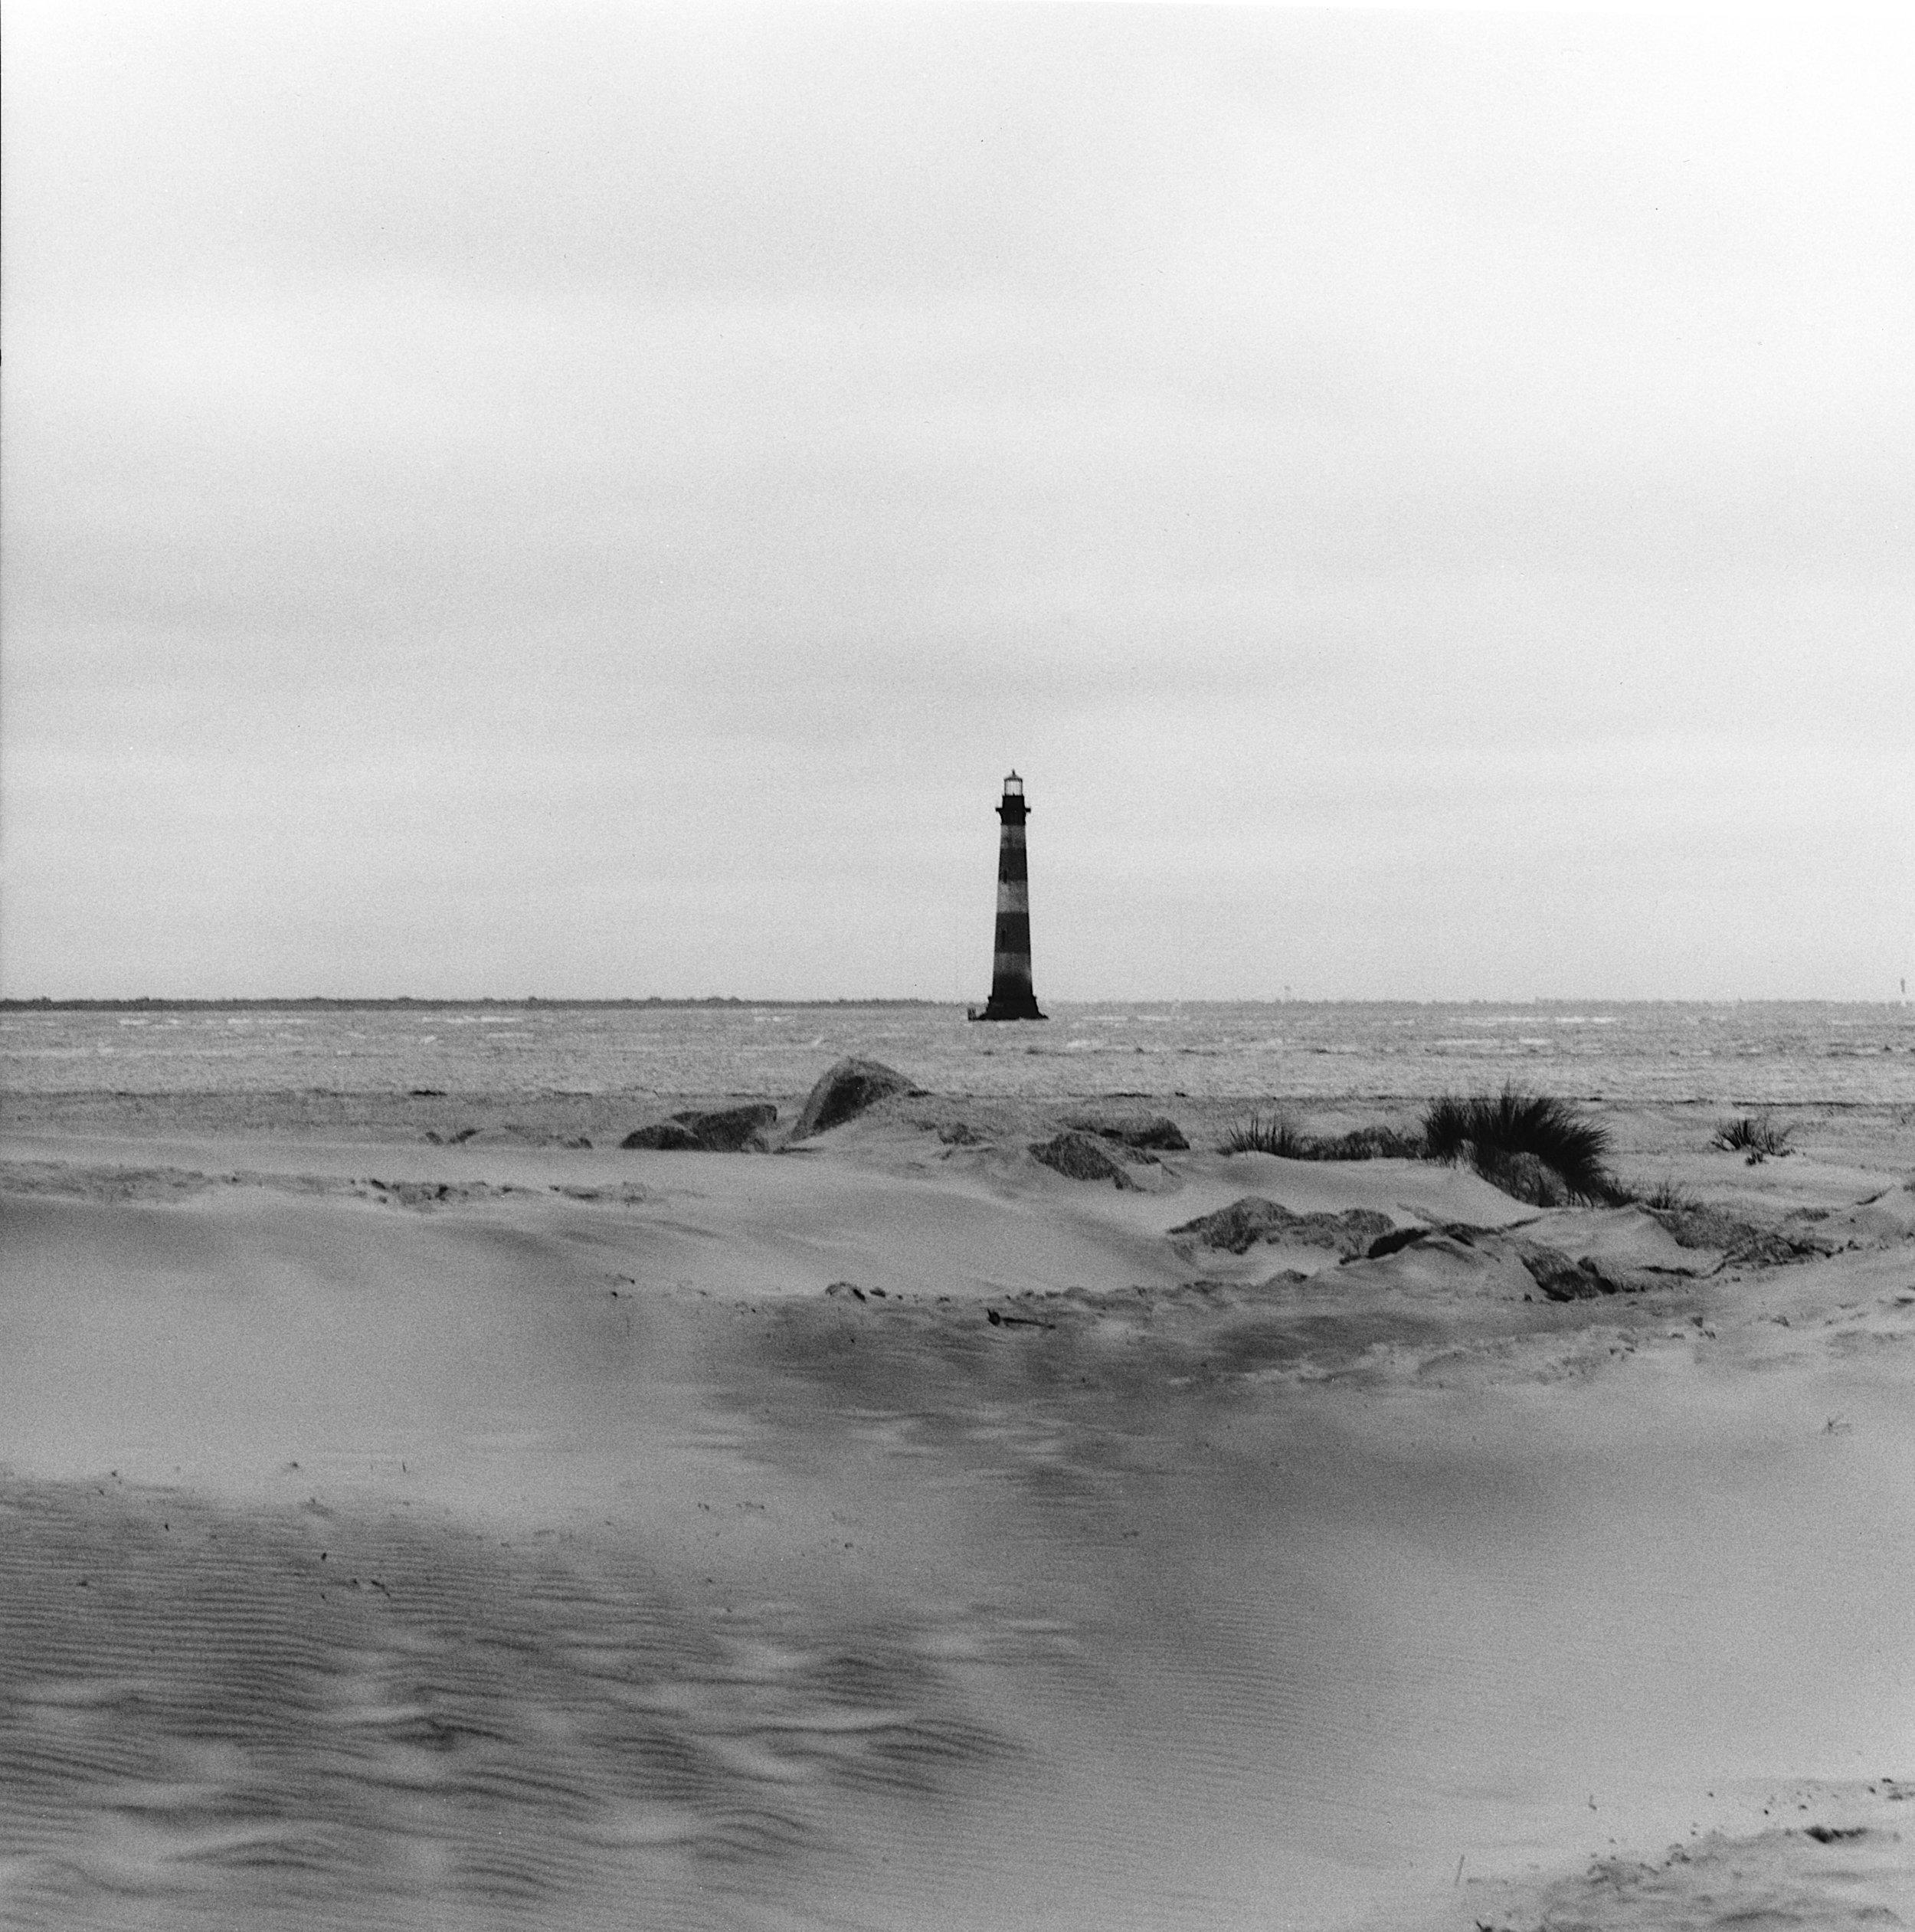 James Island looking towards Morris Island, 1999